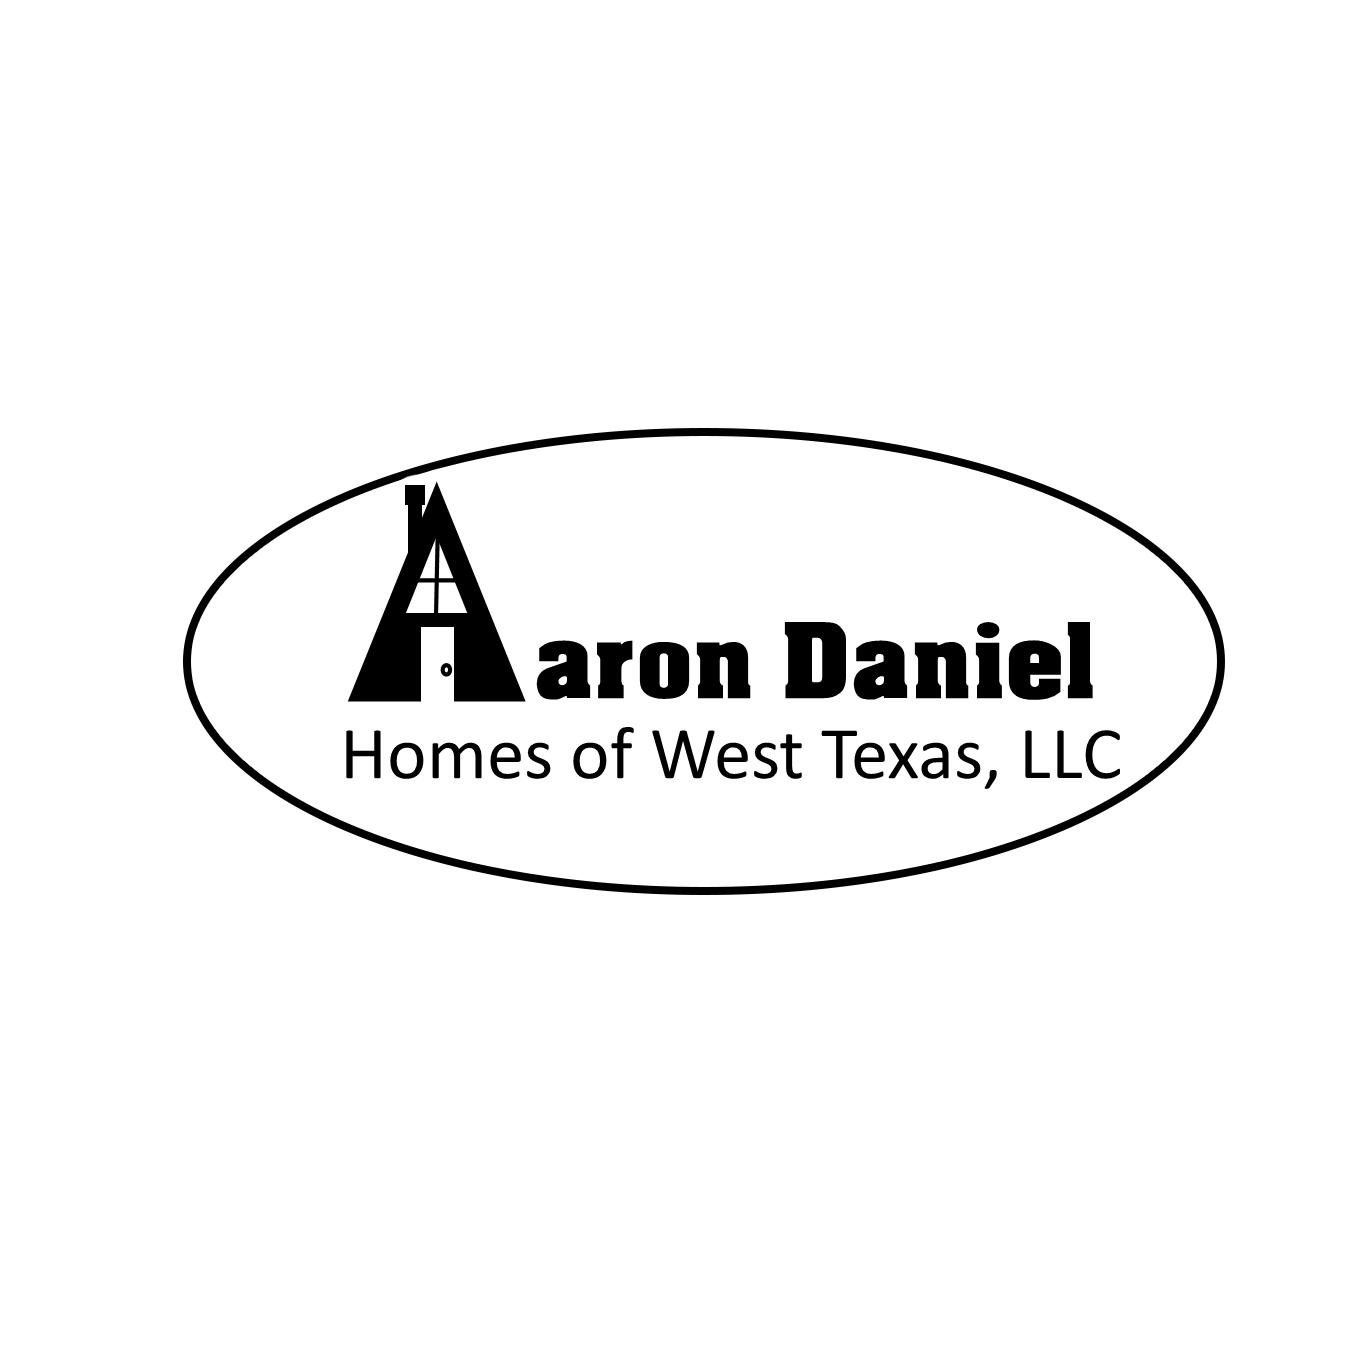 Aaron Daniel Homes of West Texas LLC